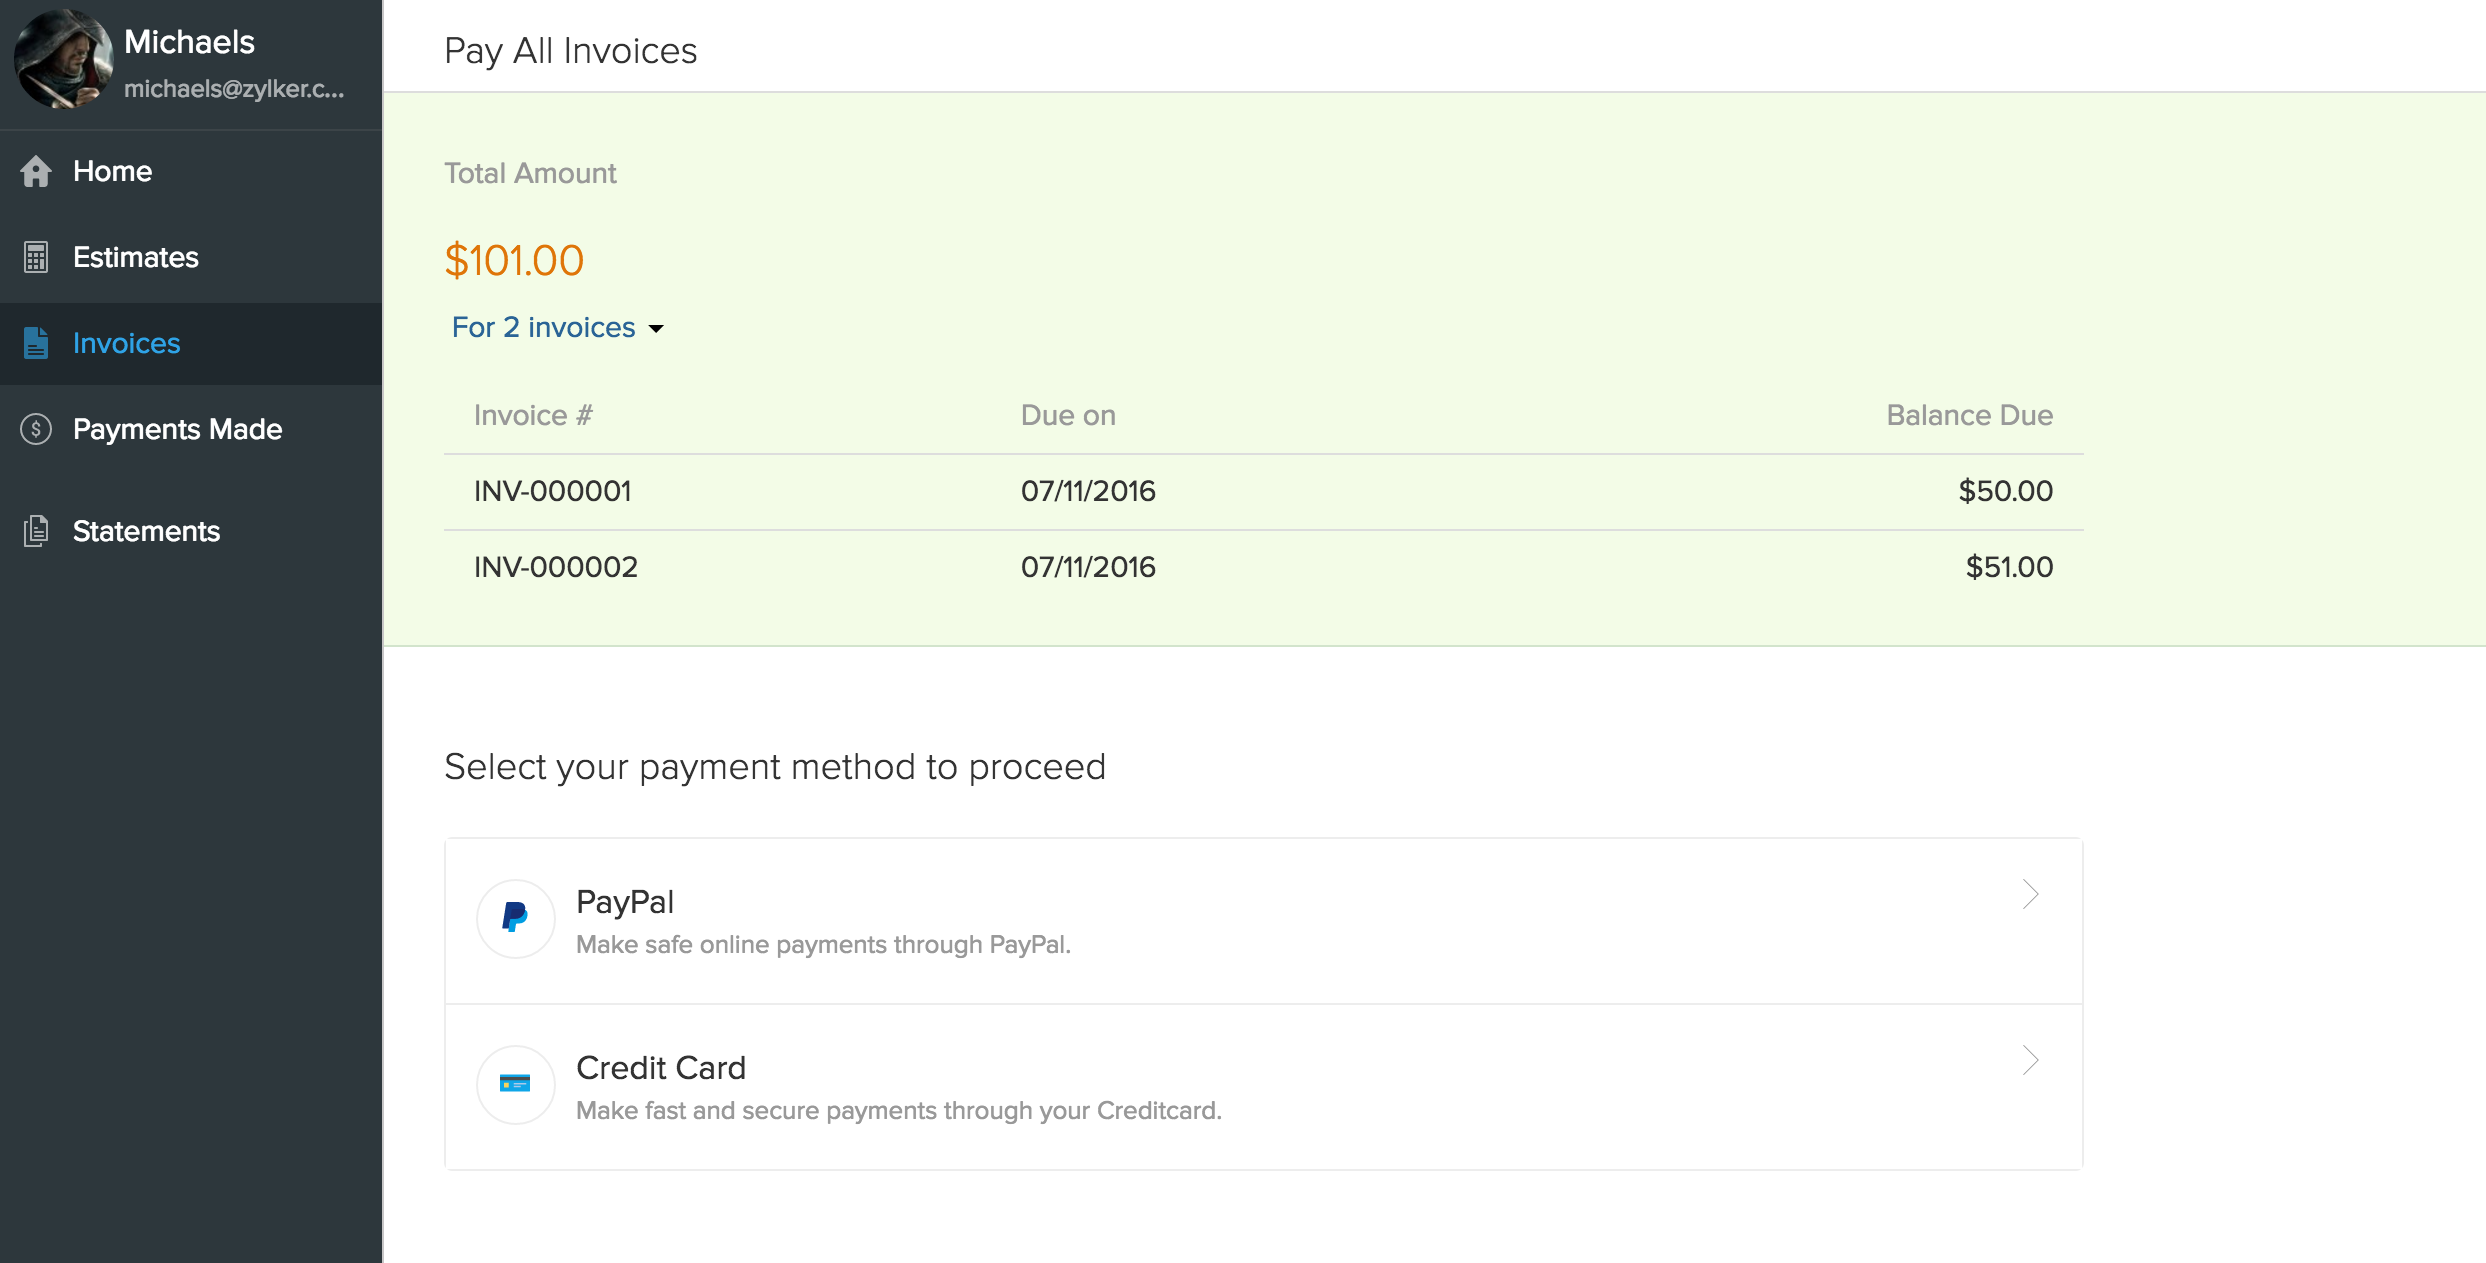 Invoice Payment Details